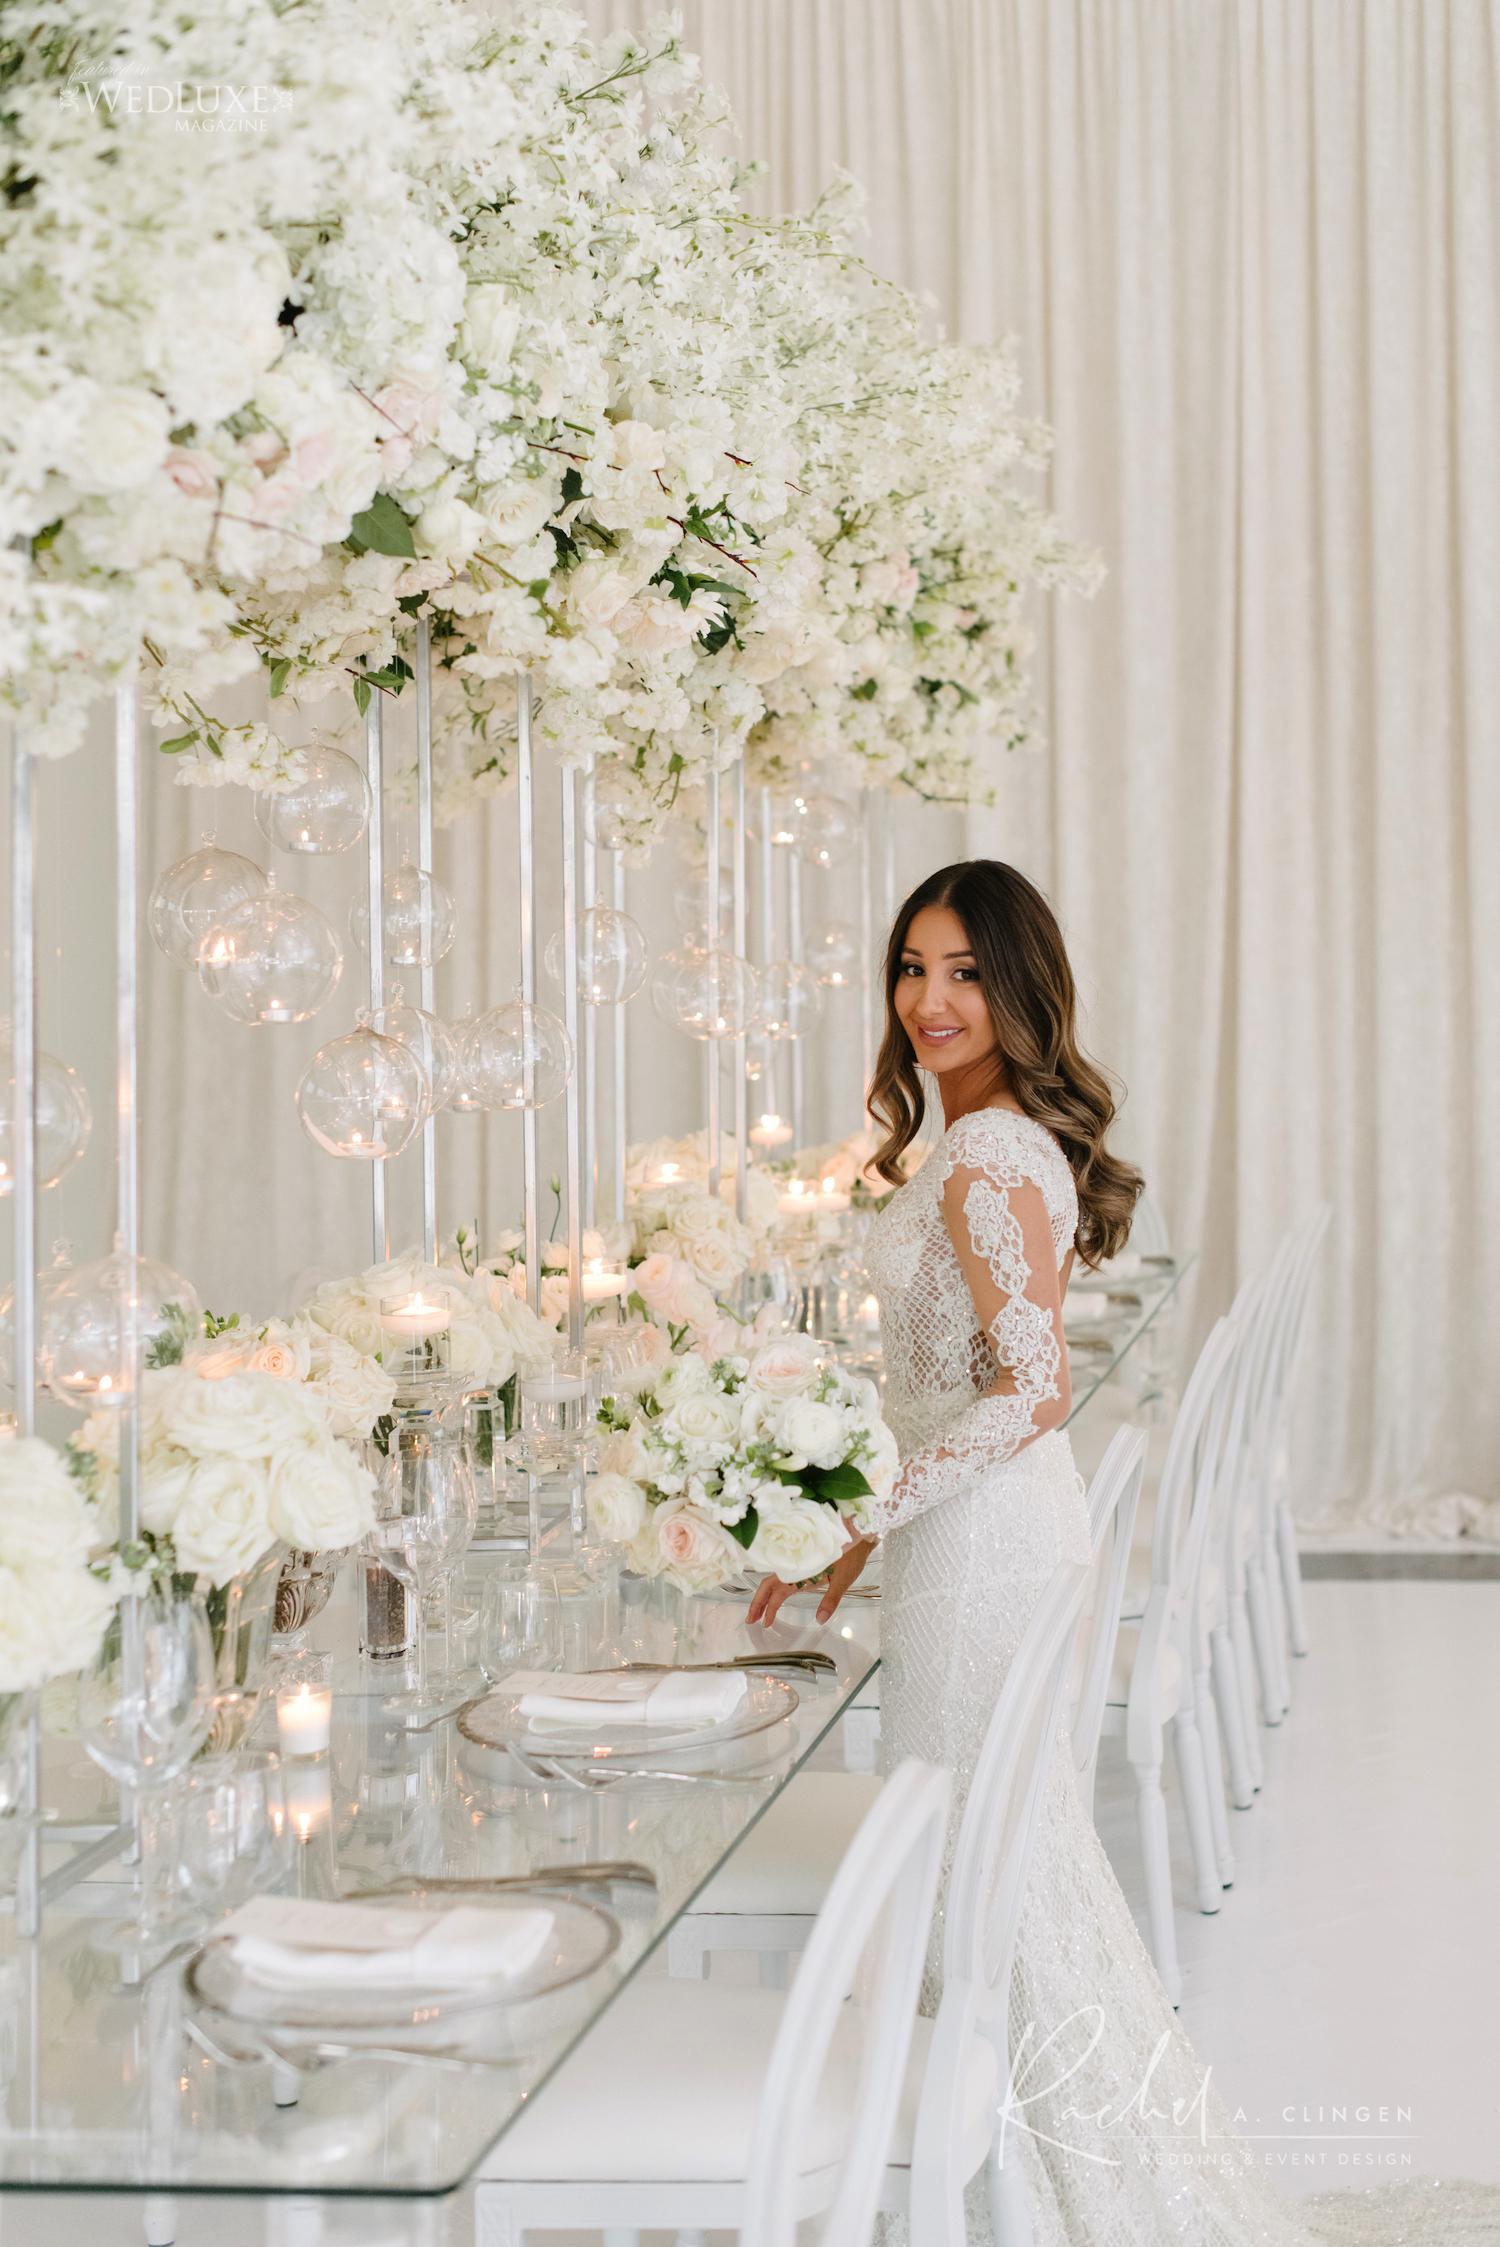 christina luxury wedding decor toronto